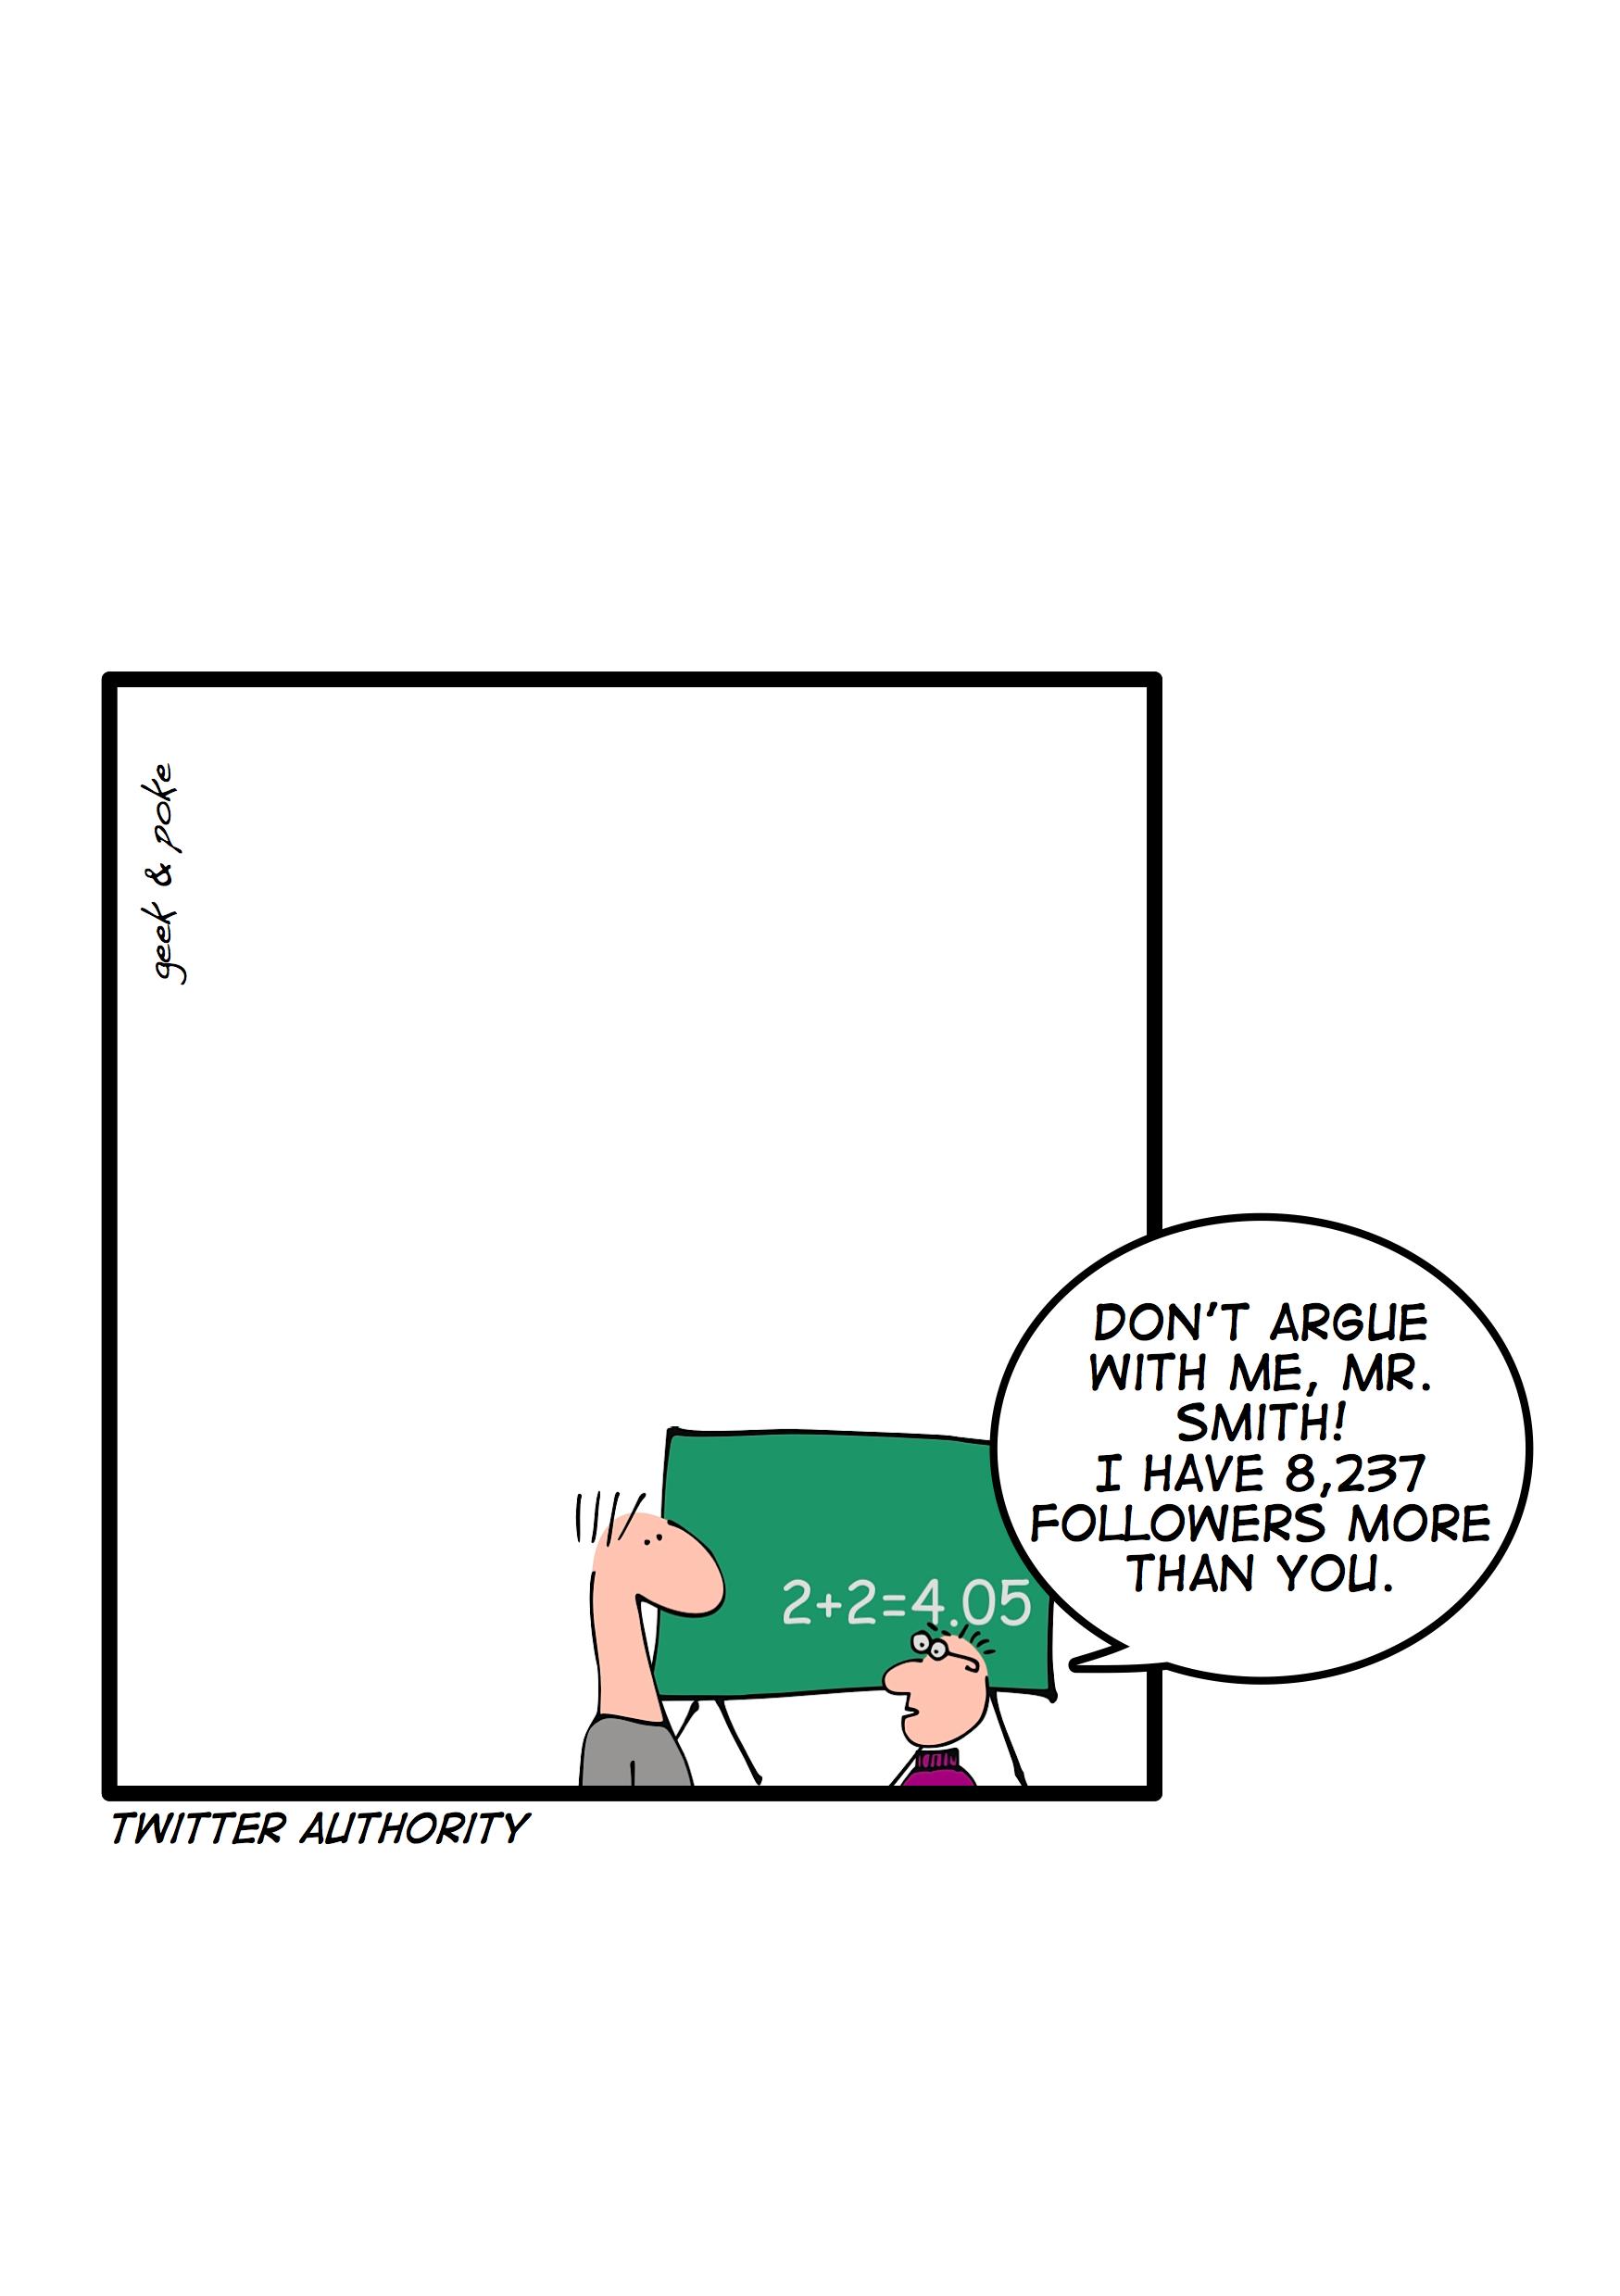 Autoridad digital. Fuente: Geek&Poke.